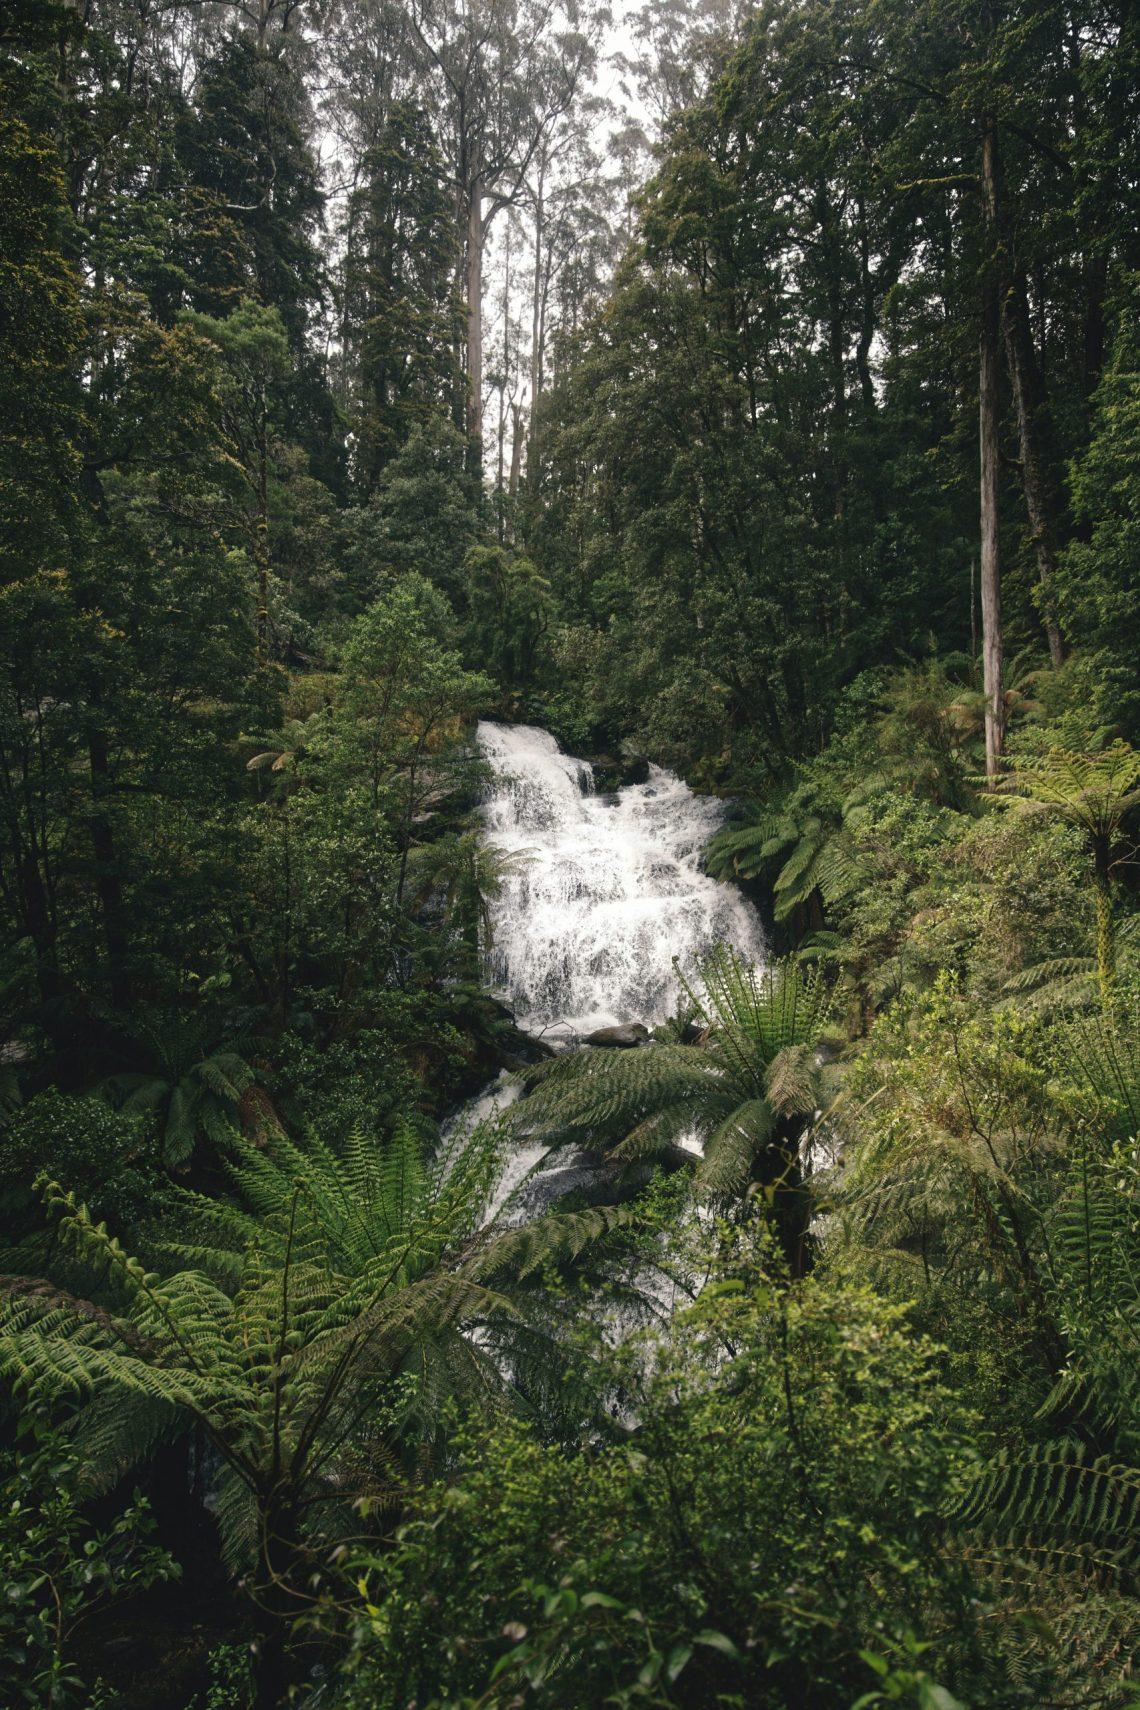 Unsplash/botanicalnature